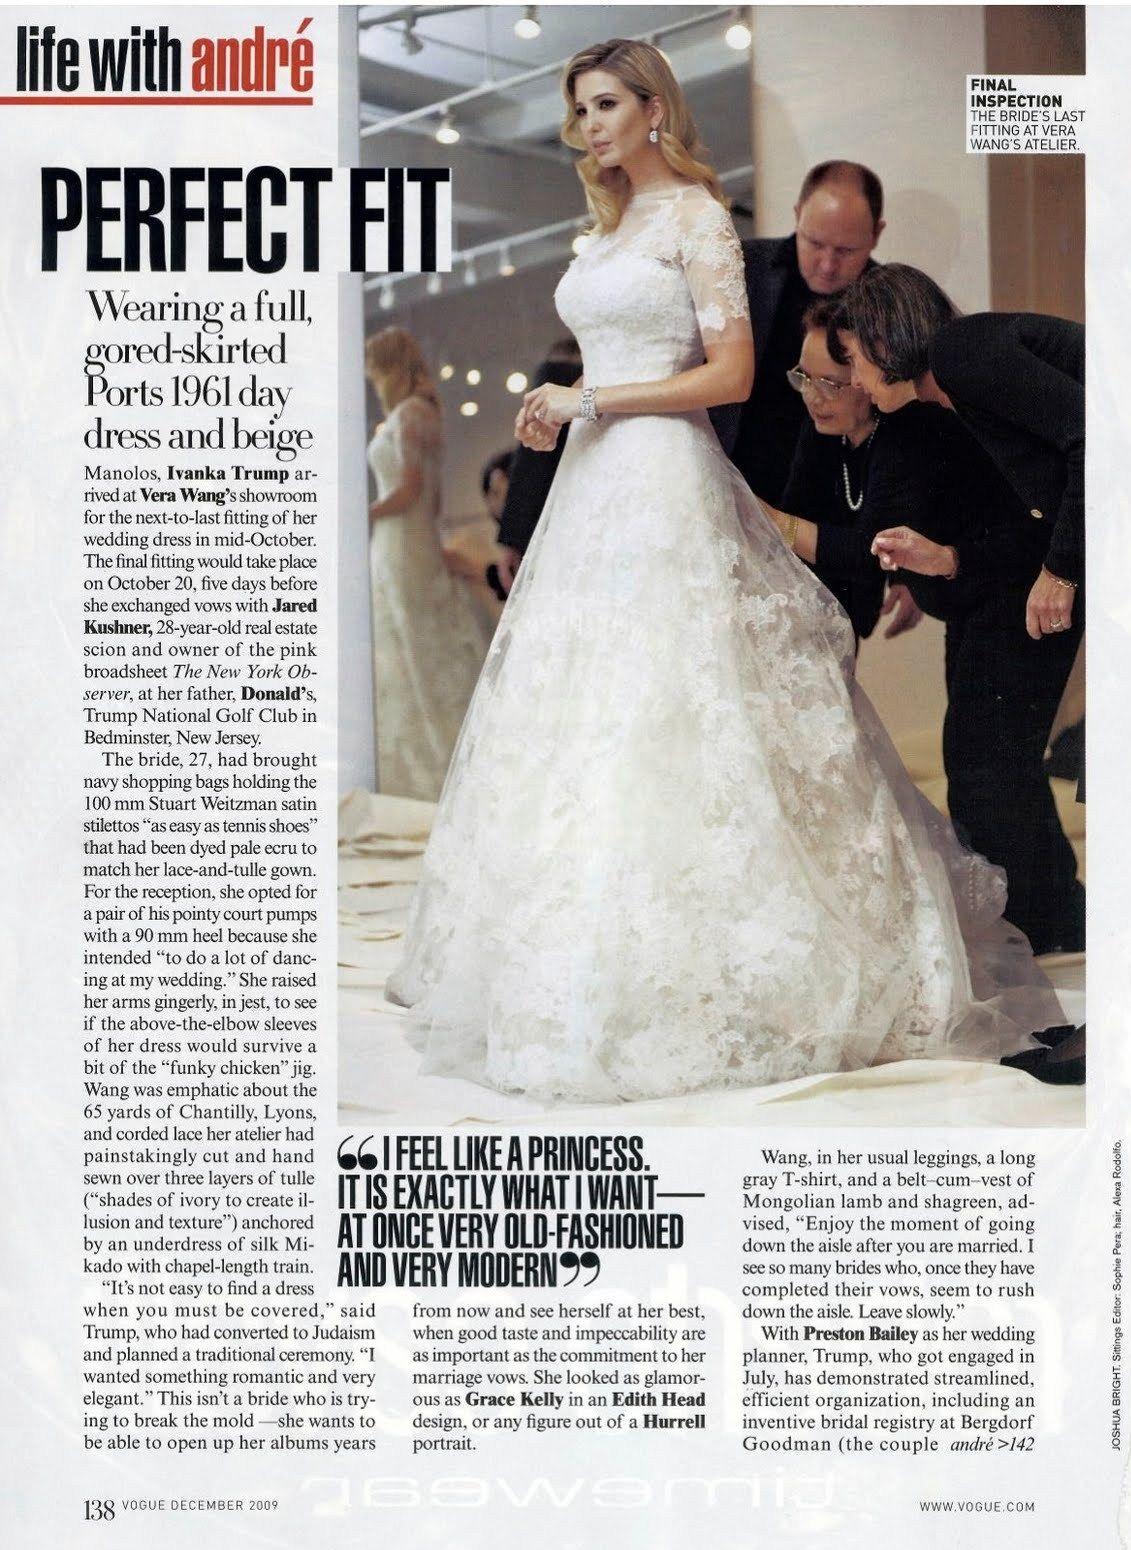 Full View Dream Wedding Wedding Wedding Dresses Ivanka Trump